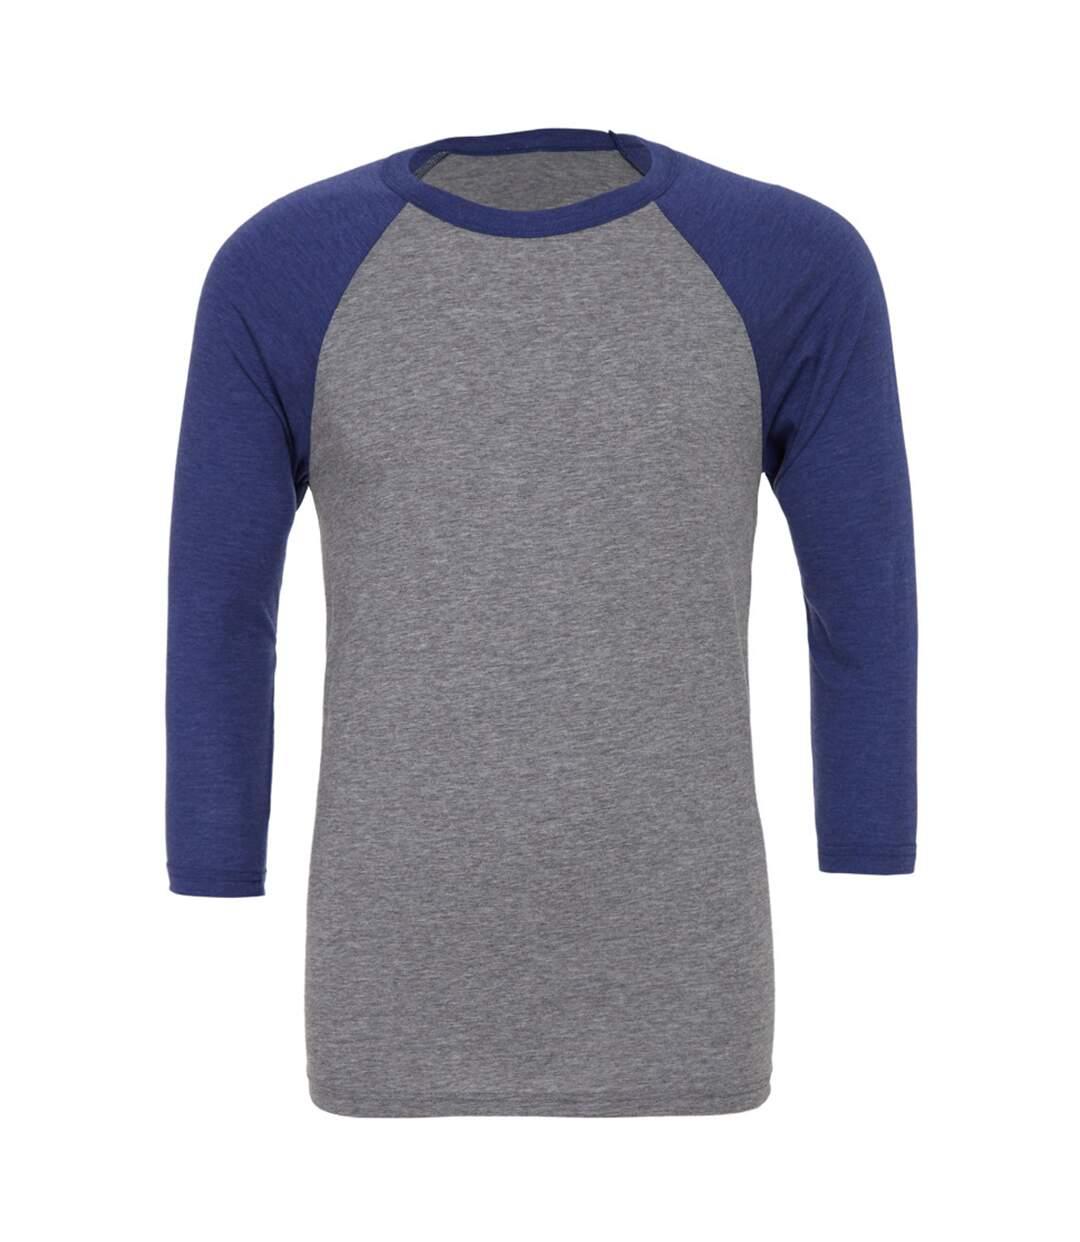 Canvas Mens 3/4 Sleeve Baseball T-Shirt (White/Deep Heather) - UTBC1332